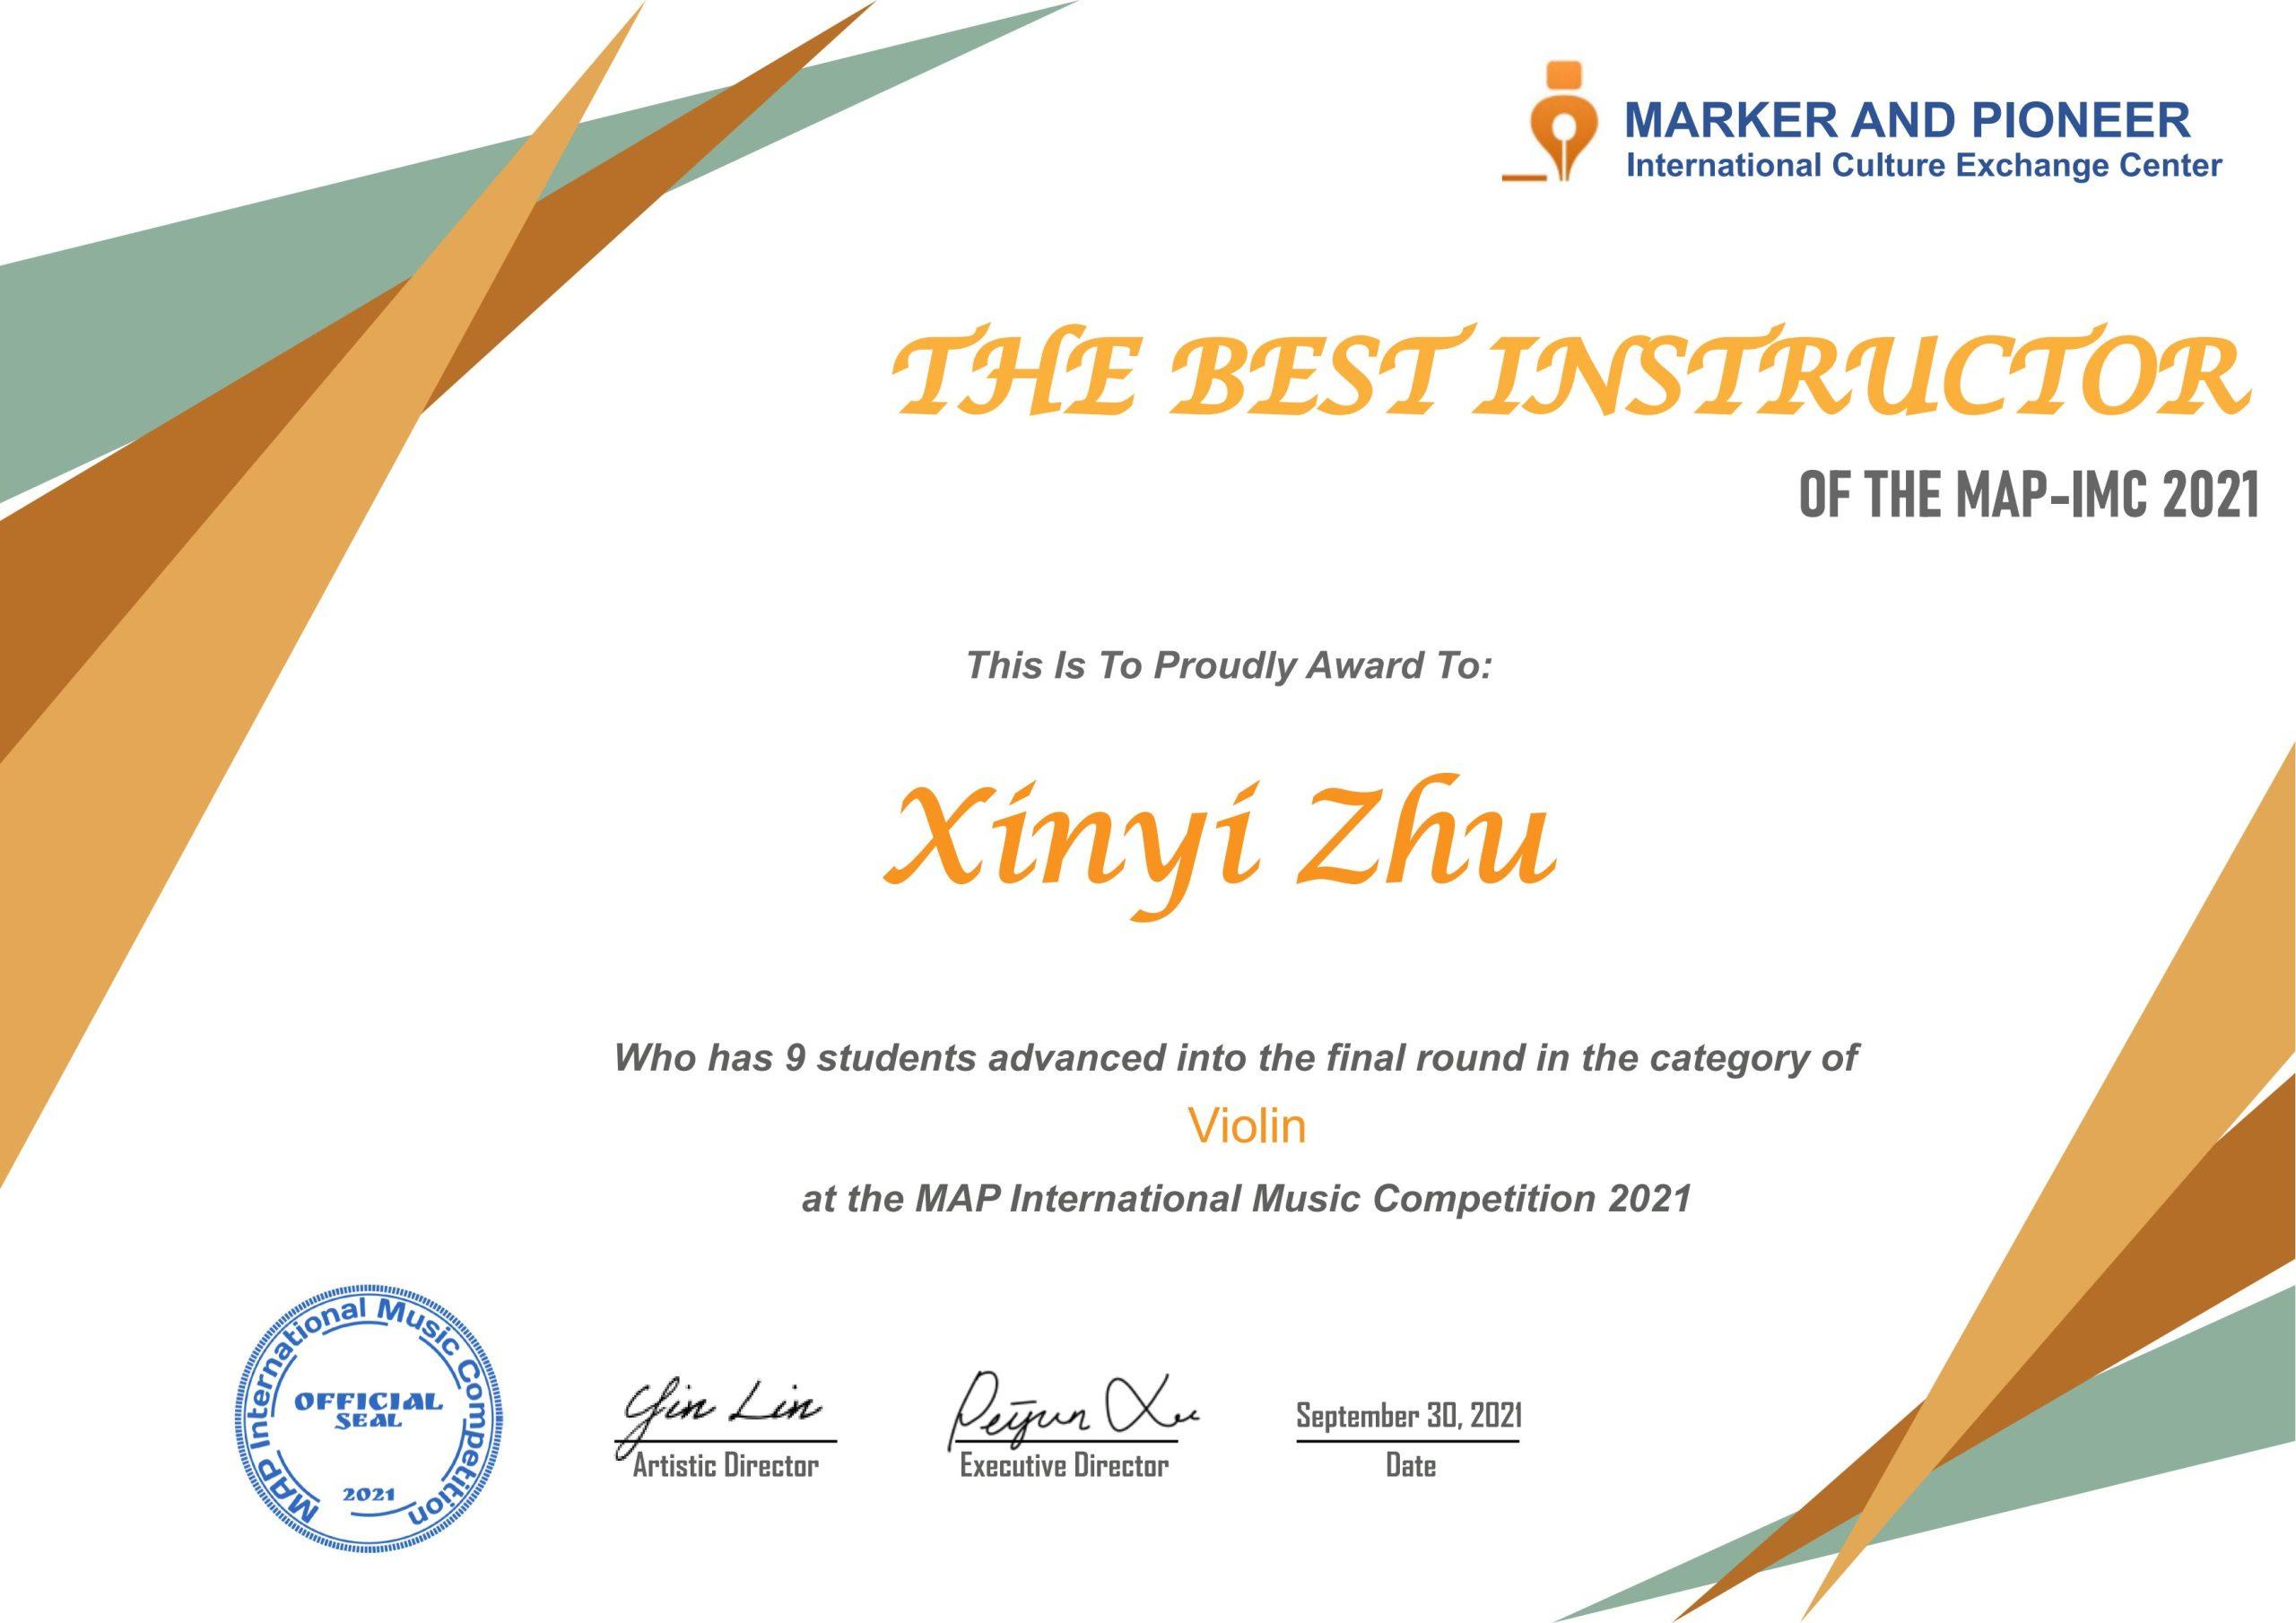 The Best Instructors at MAP-IMC 2021 / MAP国际音乐大赛最佳指导奖